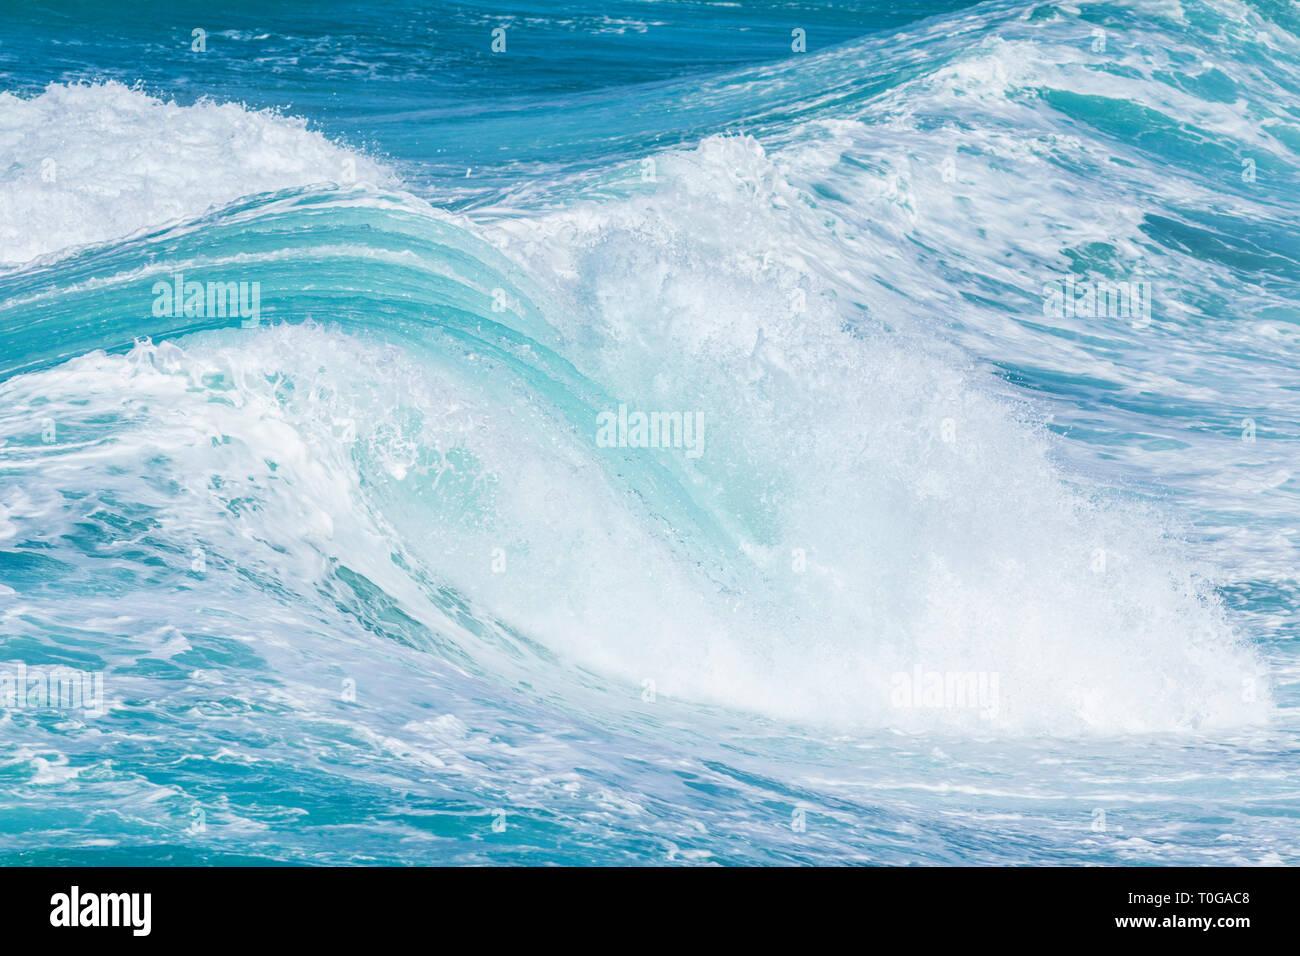 Huge Sea Waves Rolling In Towards Shore Atlantic Ocean Waves Stock Photo Alamy